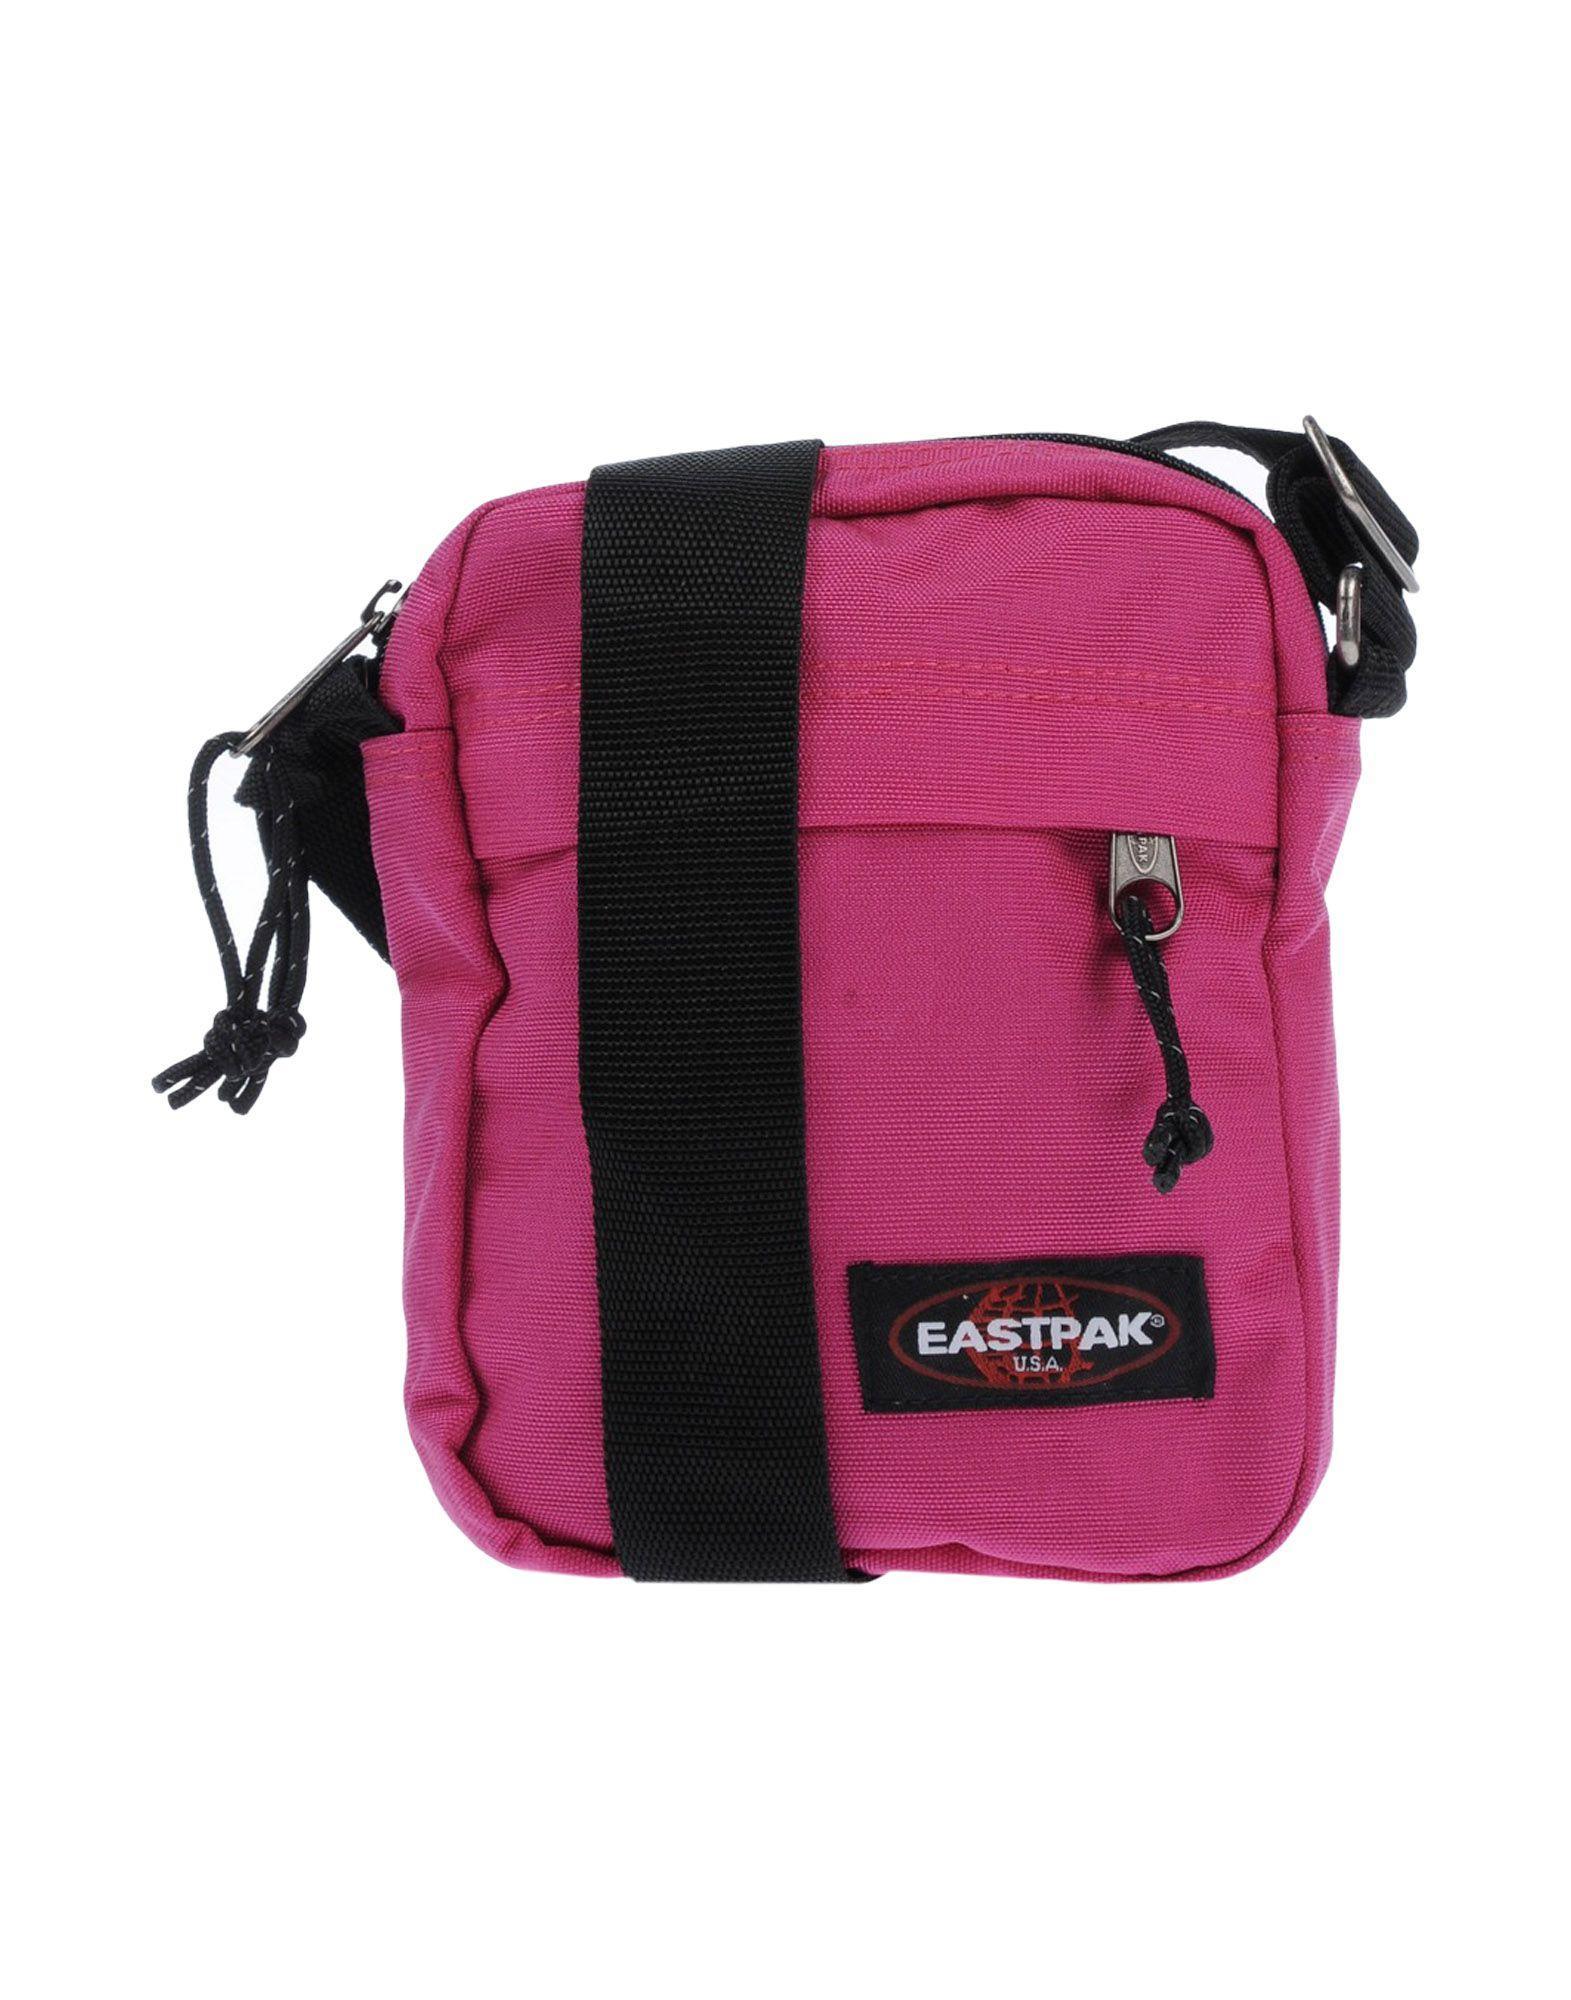 Eastpak Handbags In Fuchsia